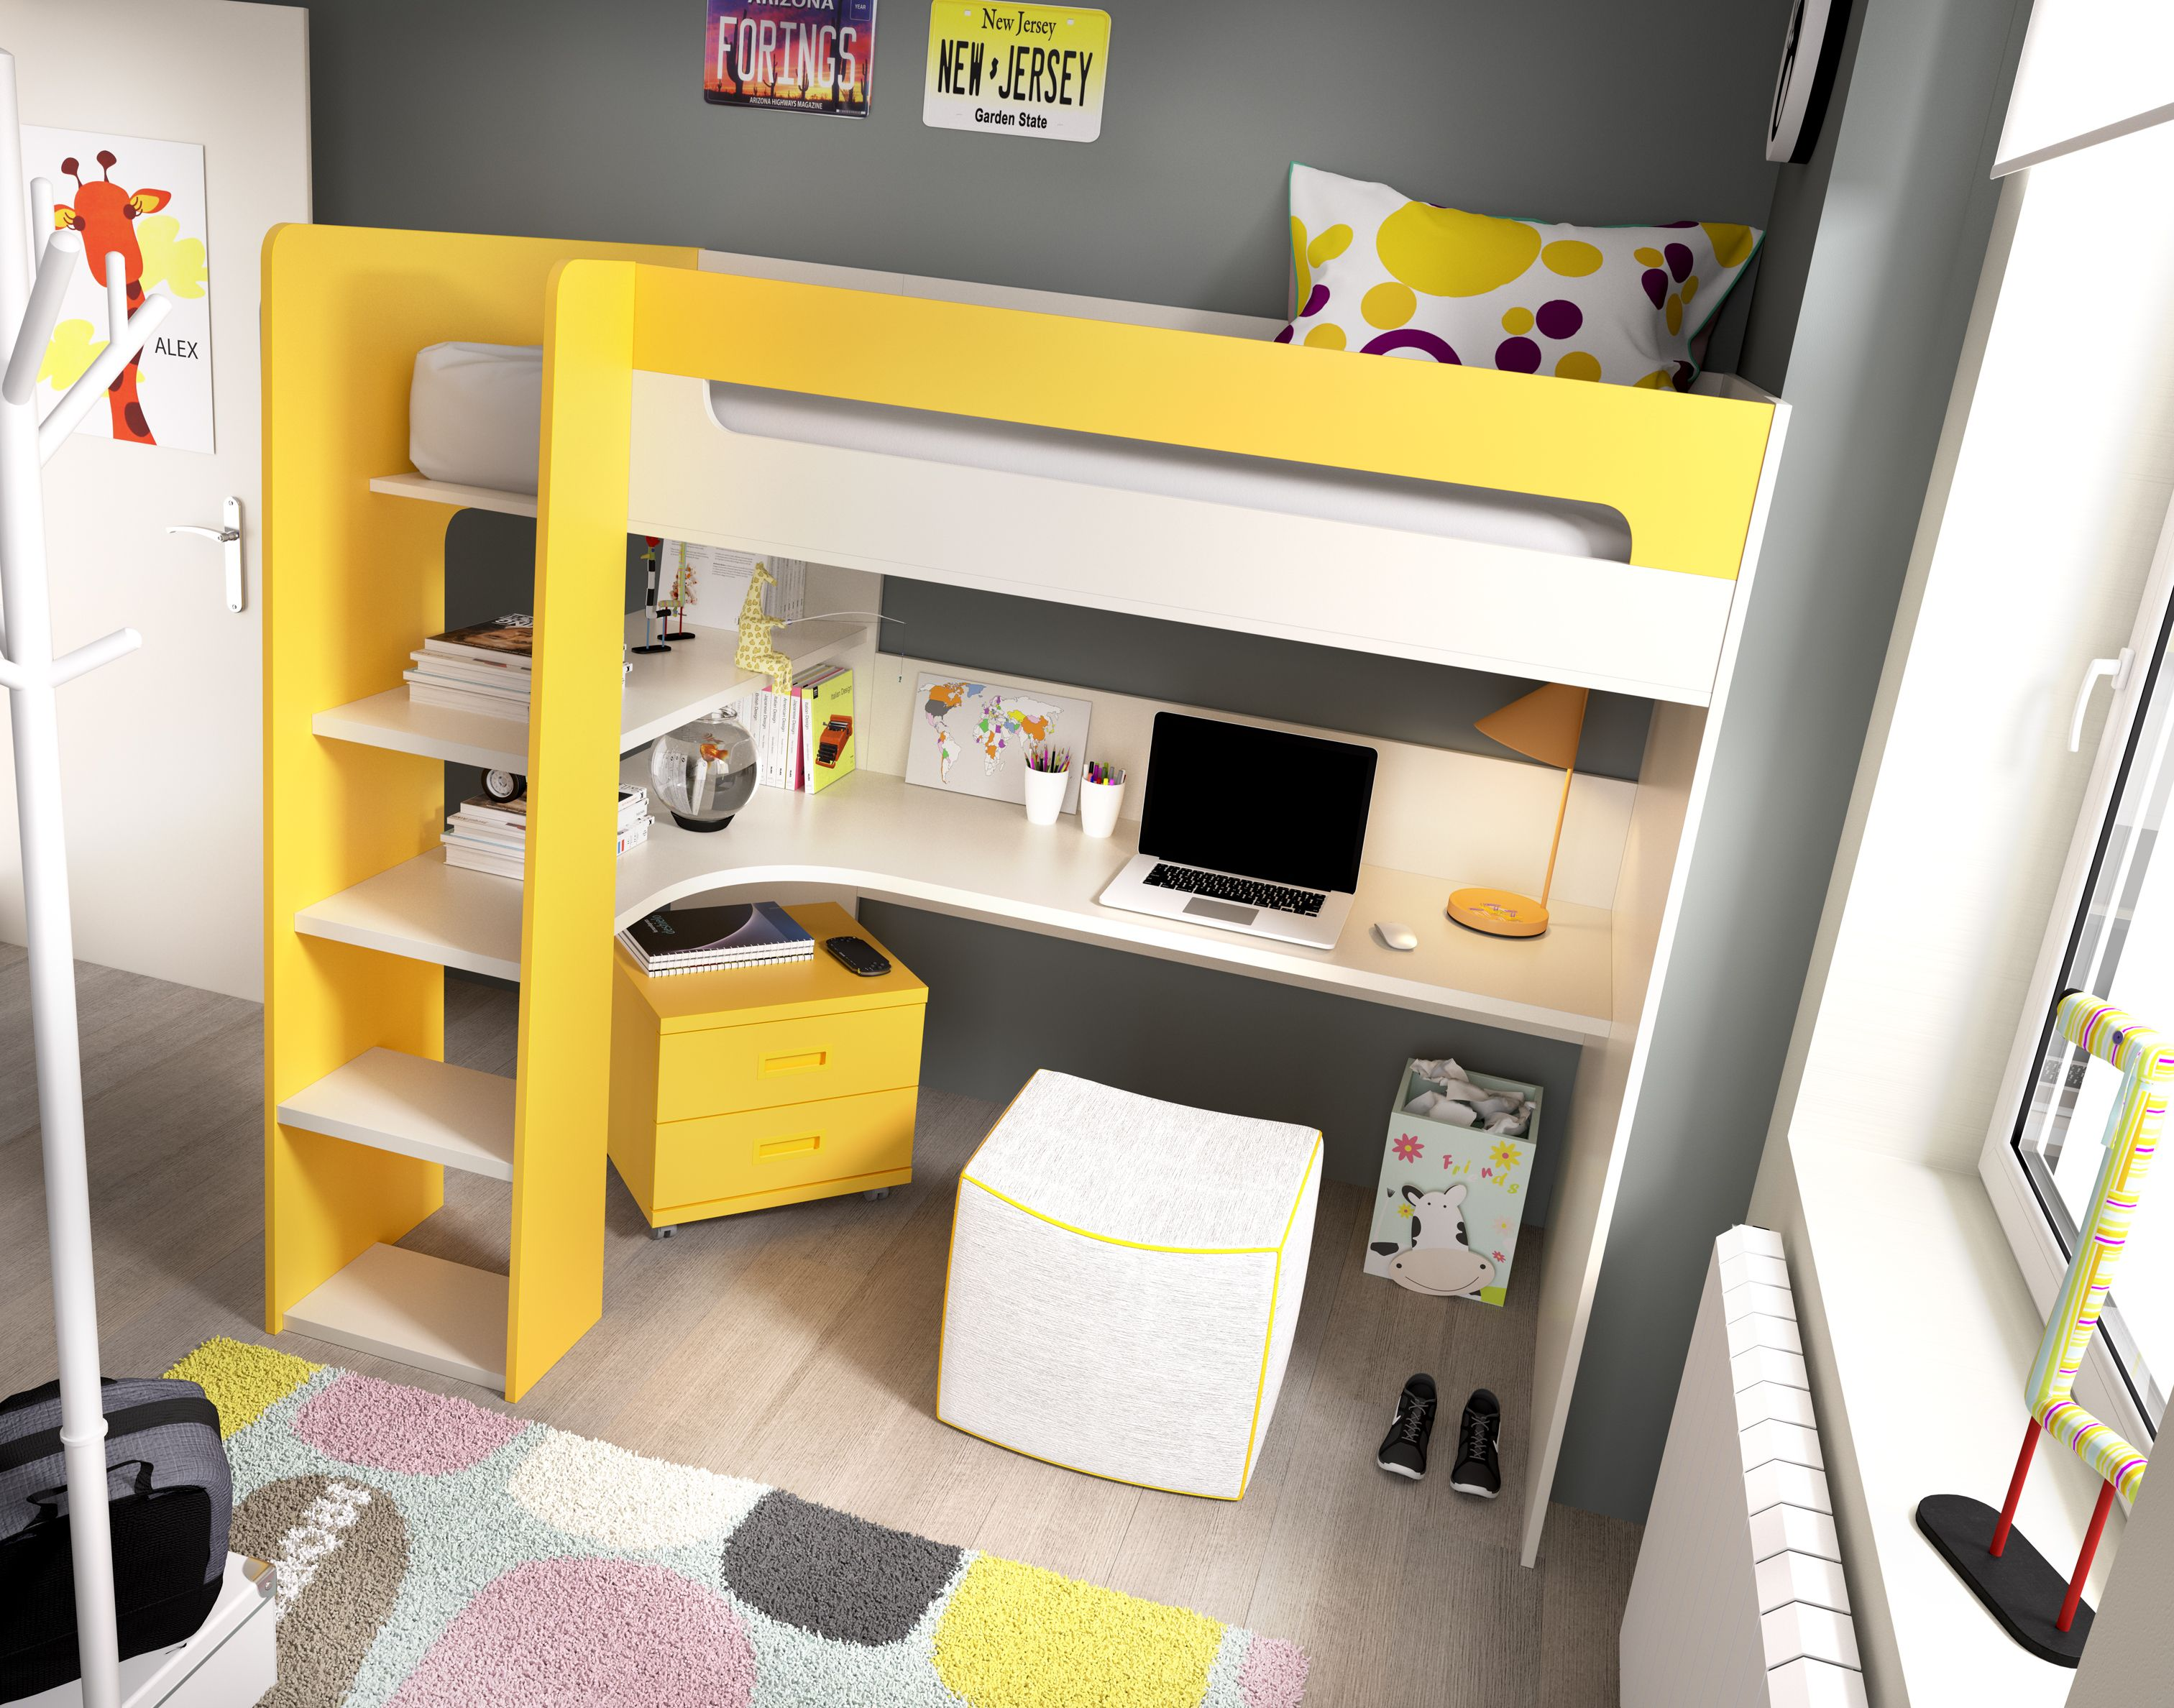 Cama Litera Con Mesa Escritorio Camas Para Dormitorios Con Poco